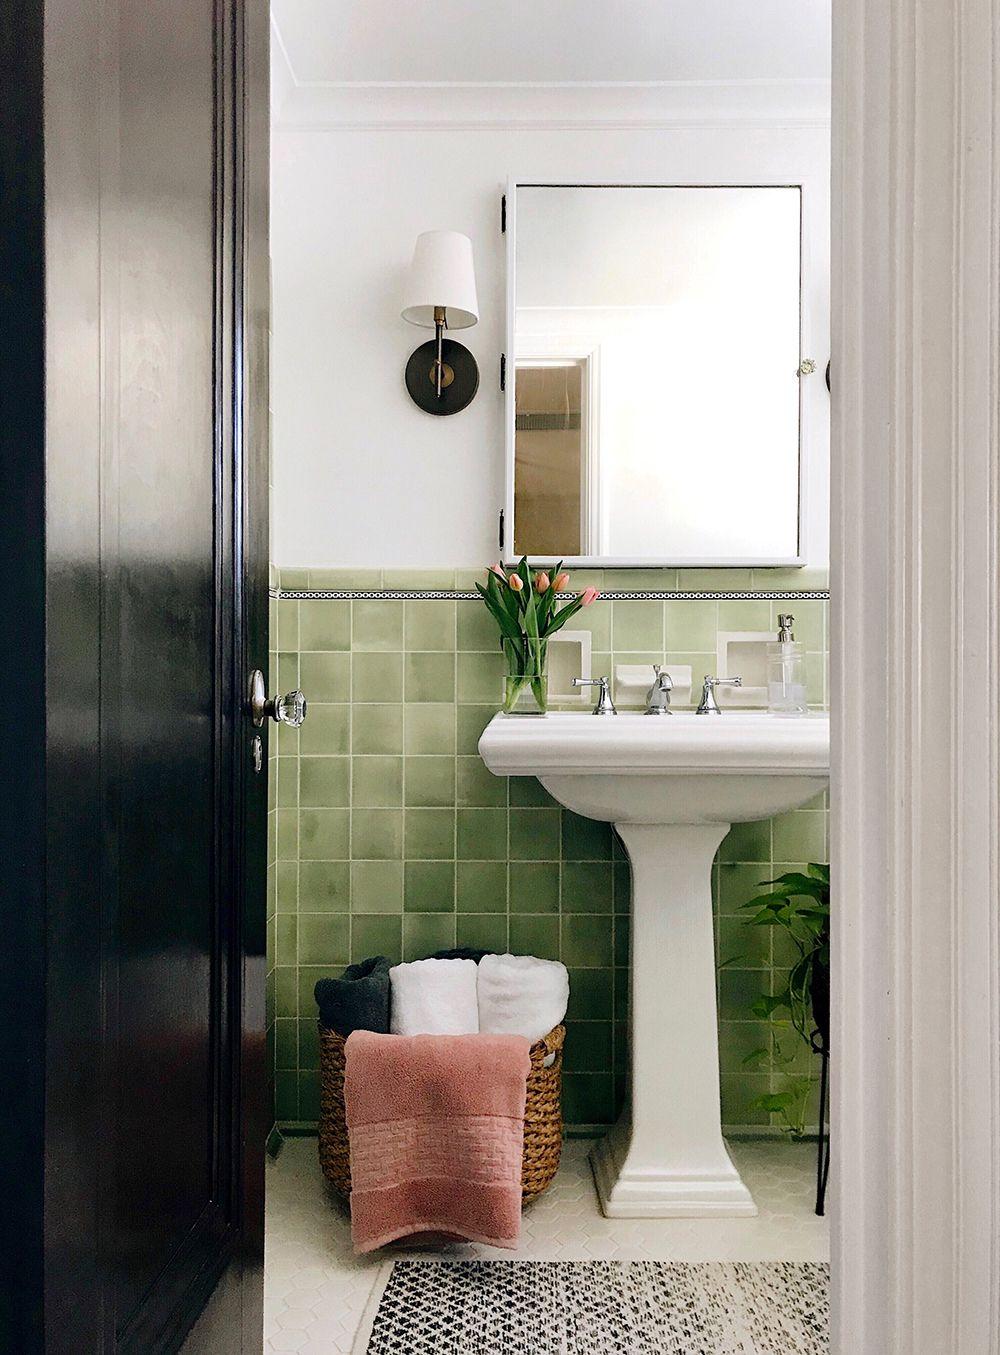 10 Pins Pinterest Inspiration Room For Tuesday Blog In 2020 Bathroom Tile Diy Bathroom Flooring Vintage Bathrooms